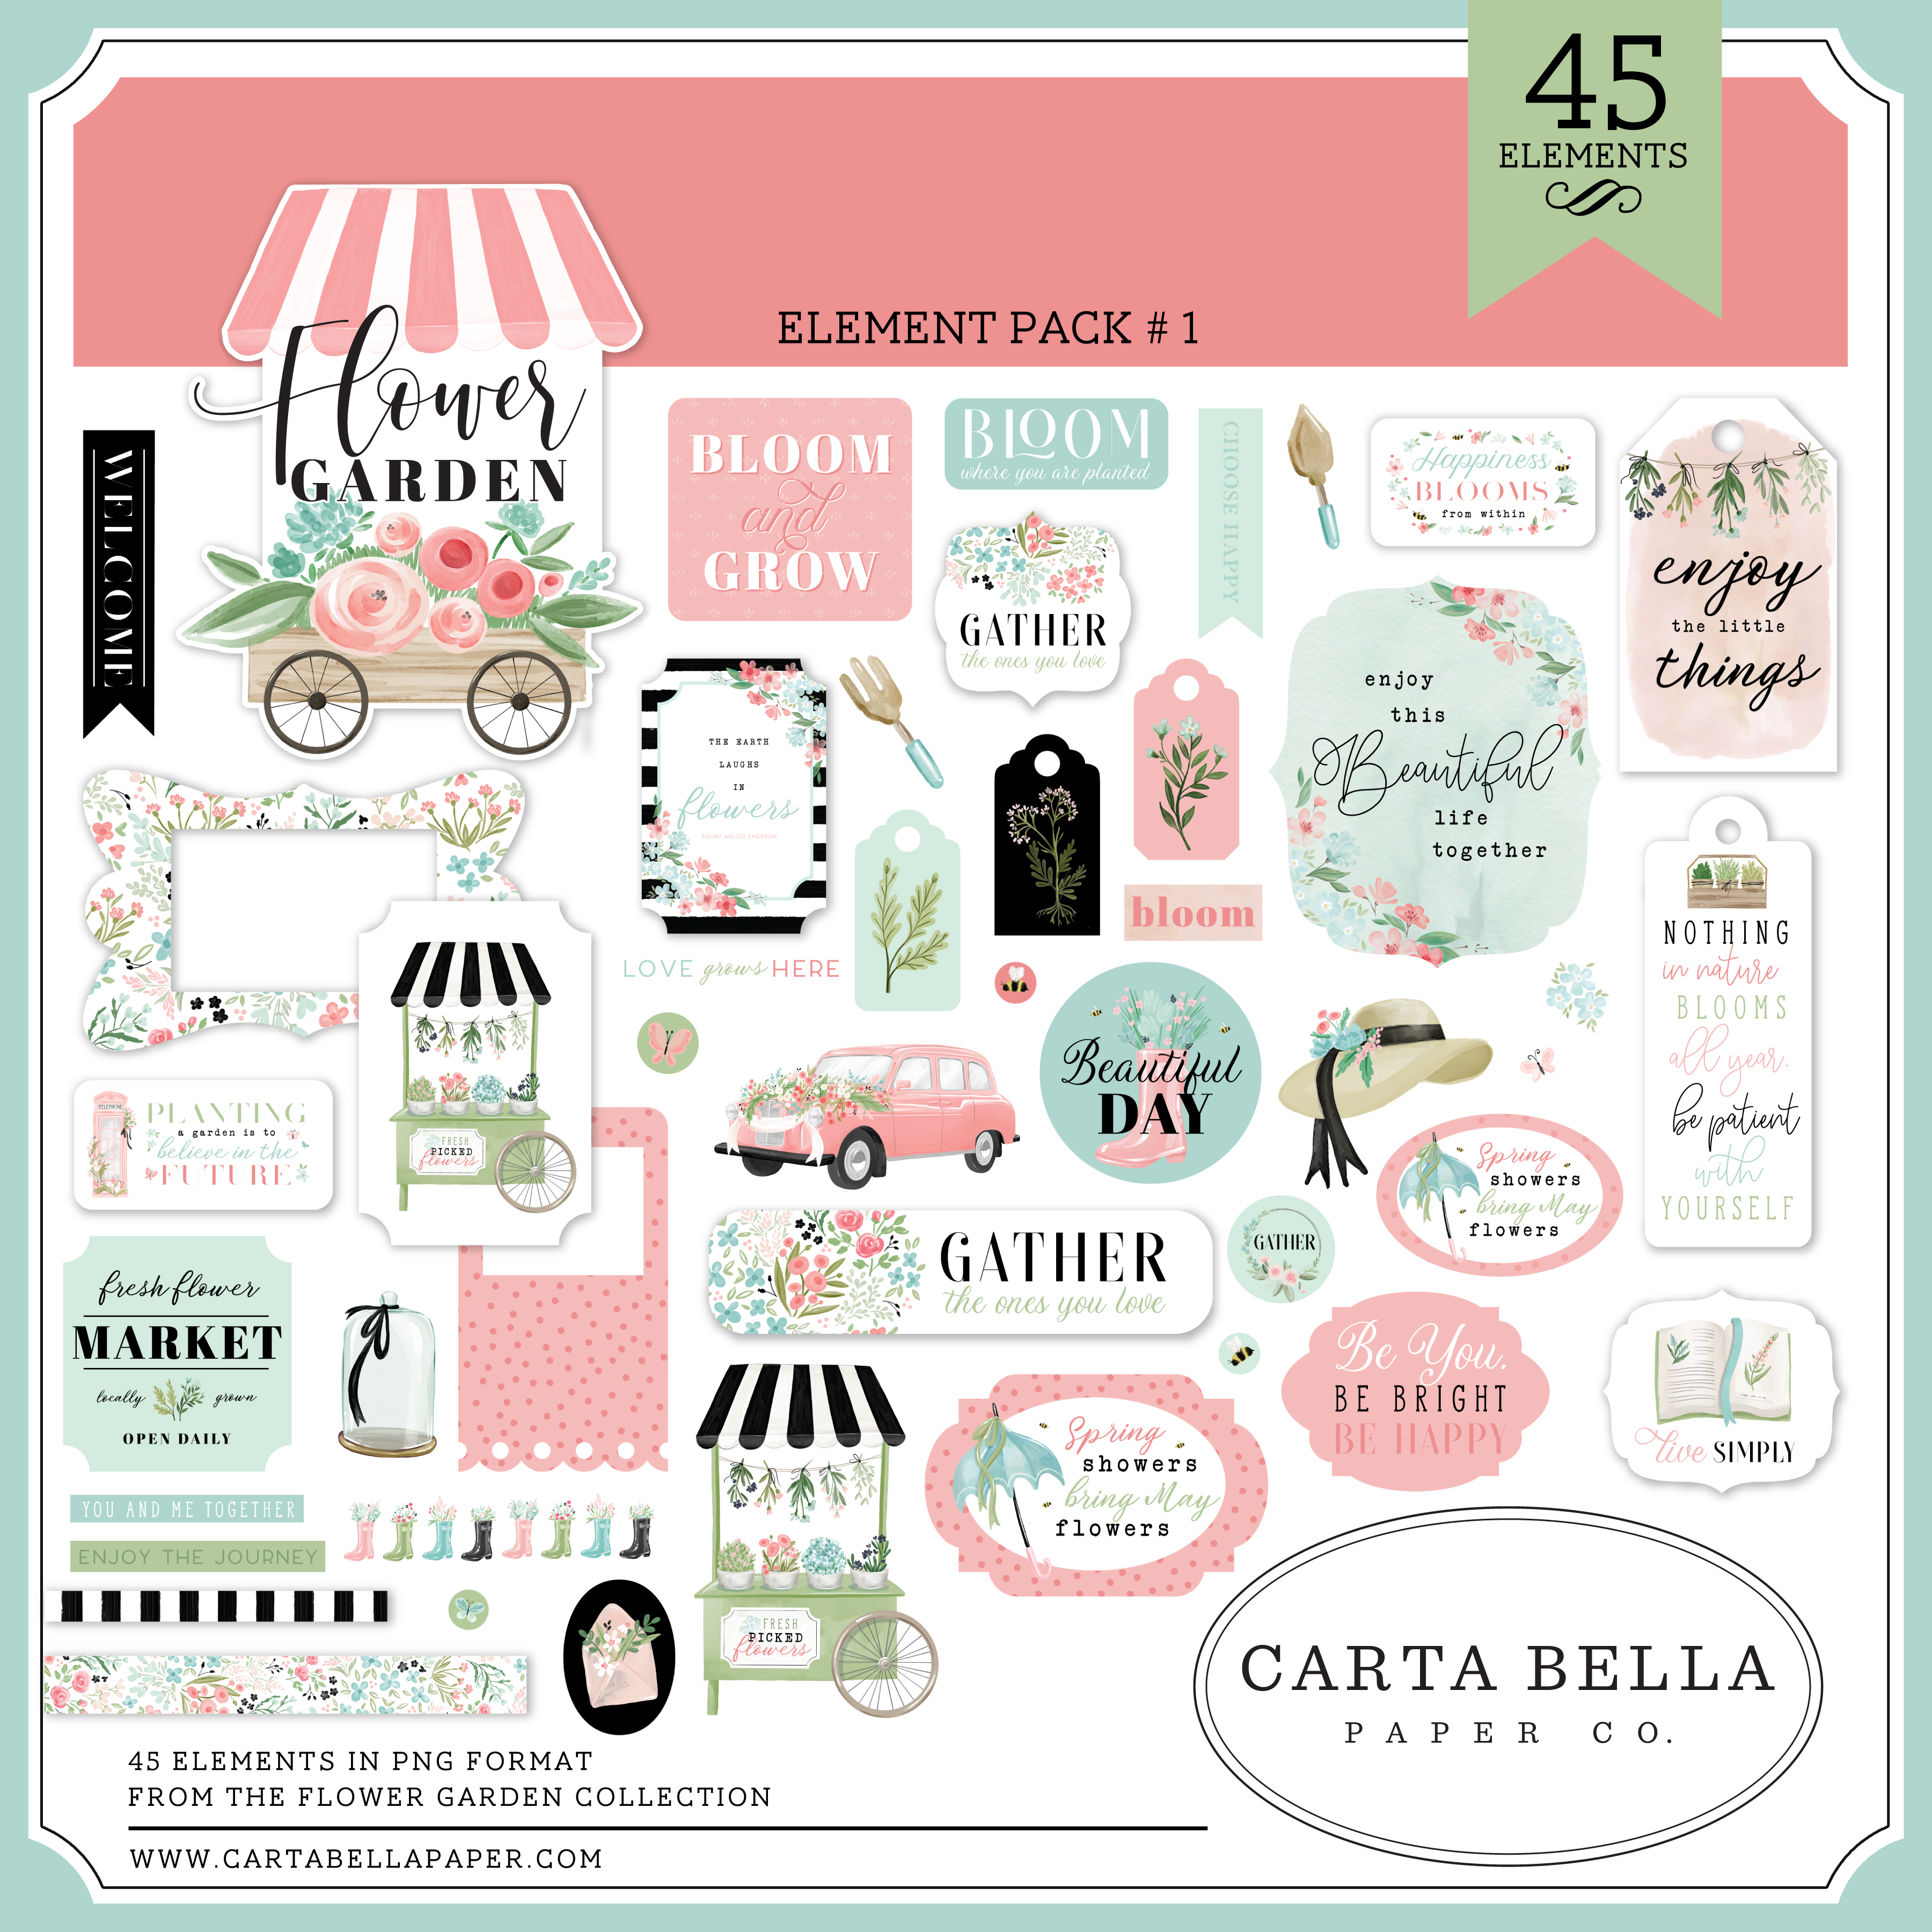 Flower Garden Element Pack #1